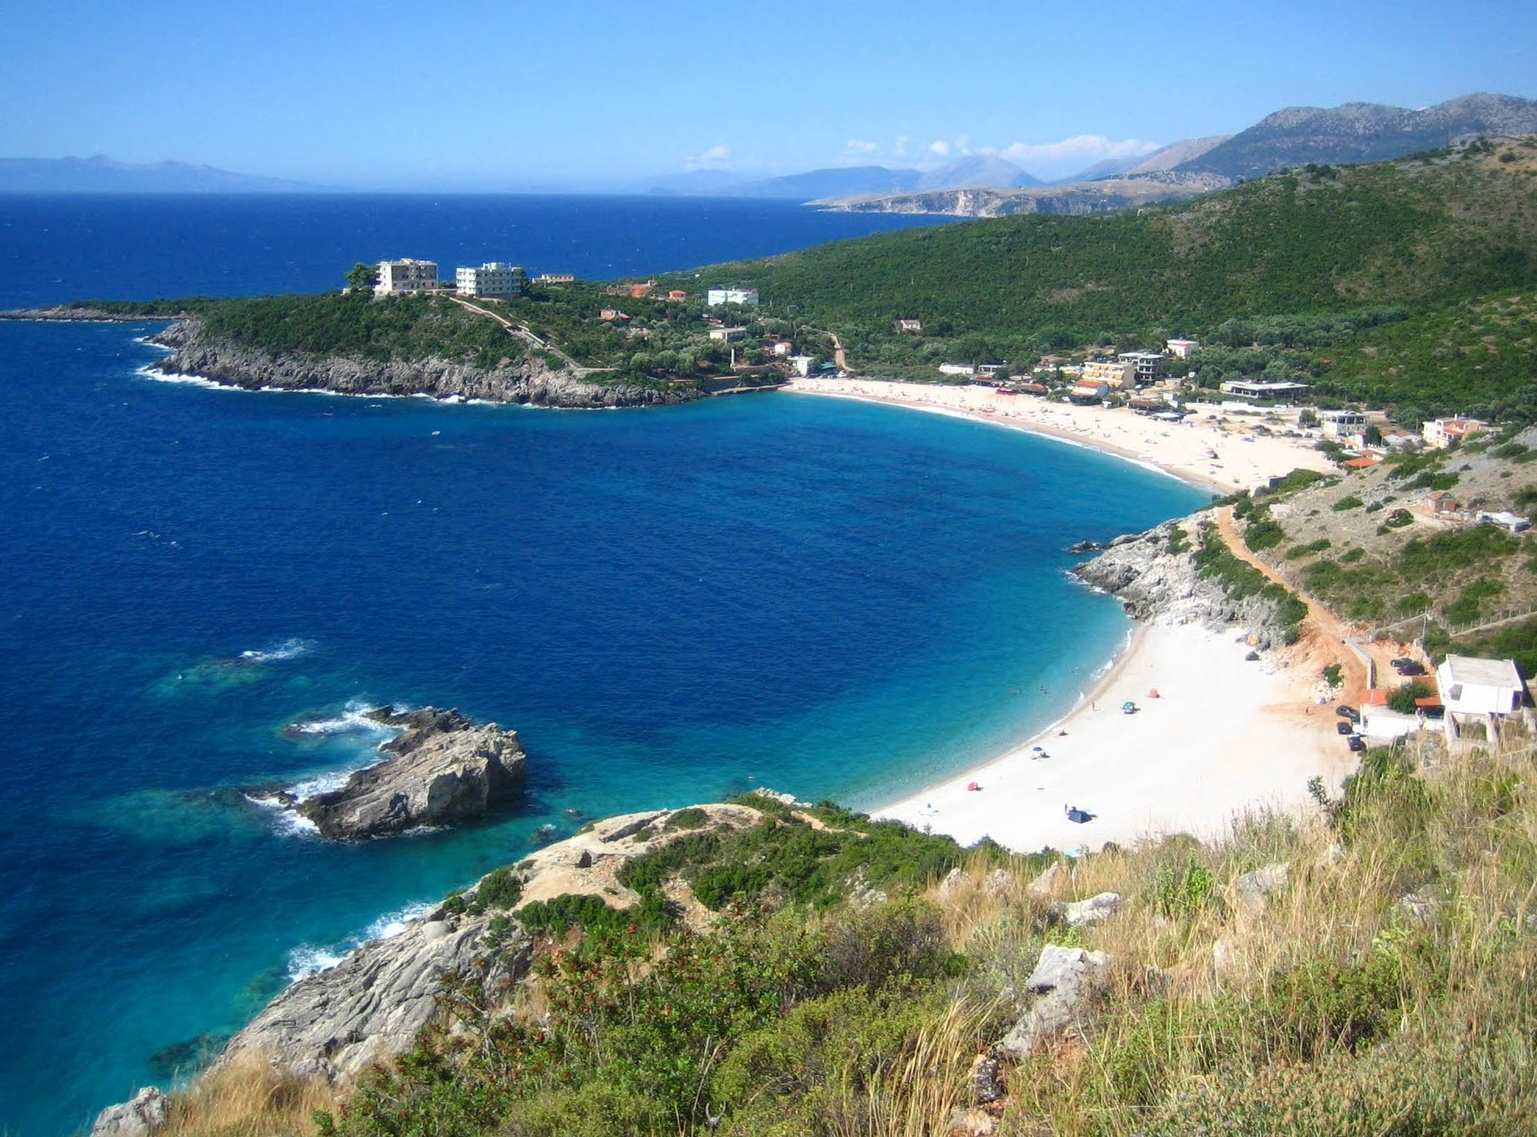 Средиземное море пляжи фото